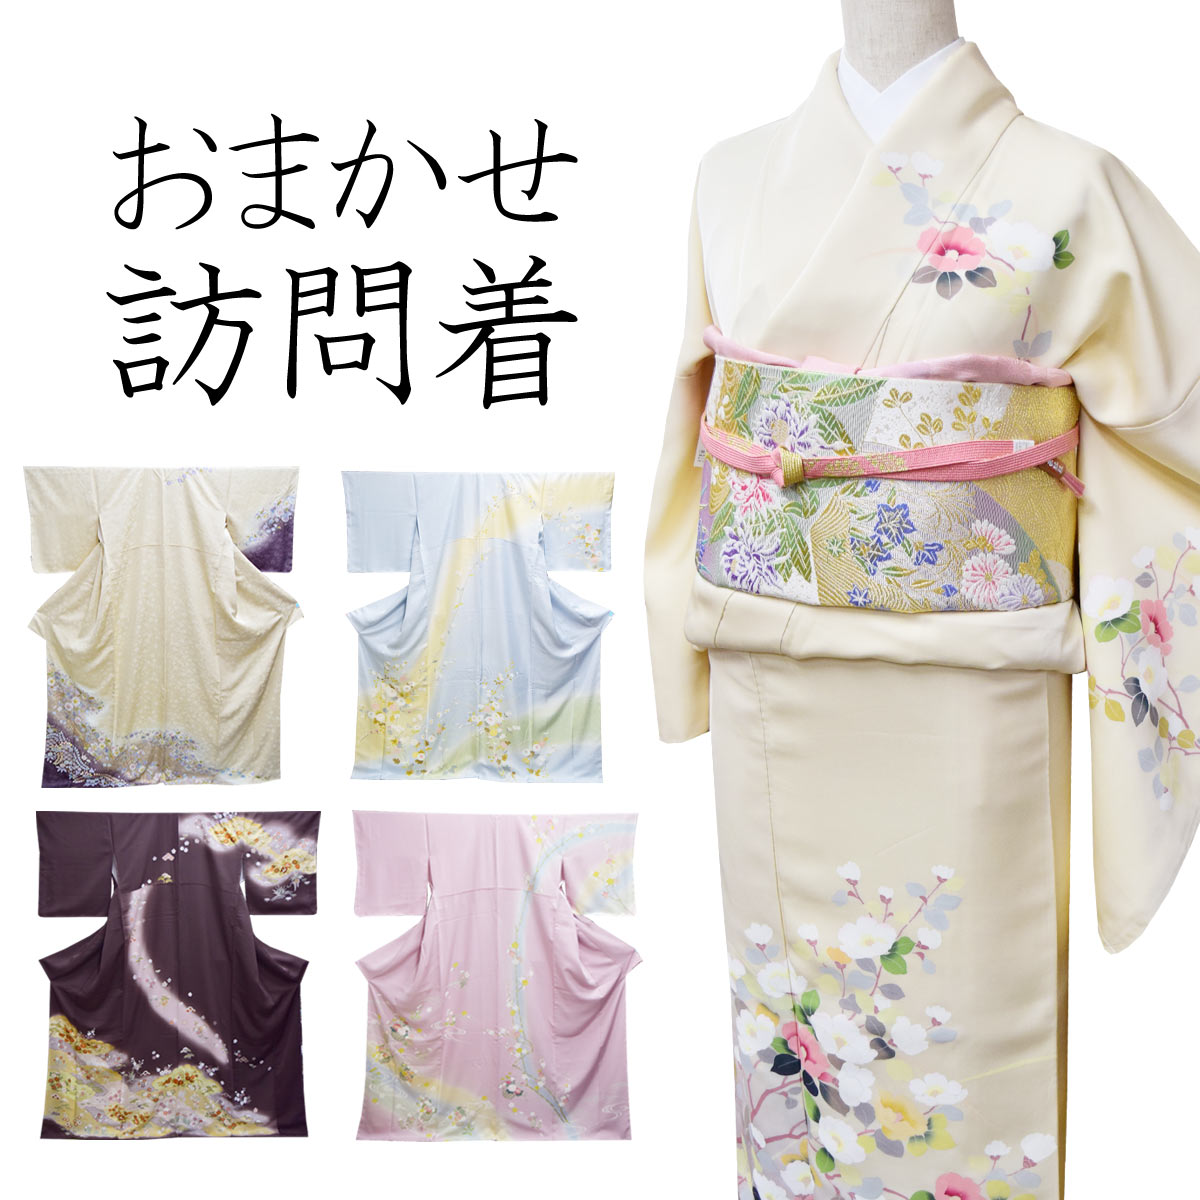 c2cb41c2225 Wadouraku Kimonoya  Finished visiting dress number hmg-1 Lady s four circle  one piece of article kimono wedding ceremony Seven-Five-Three Festival  entering ...